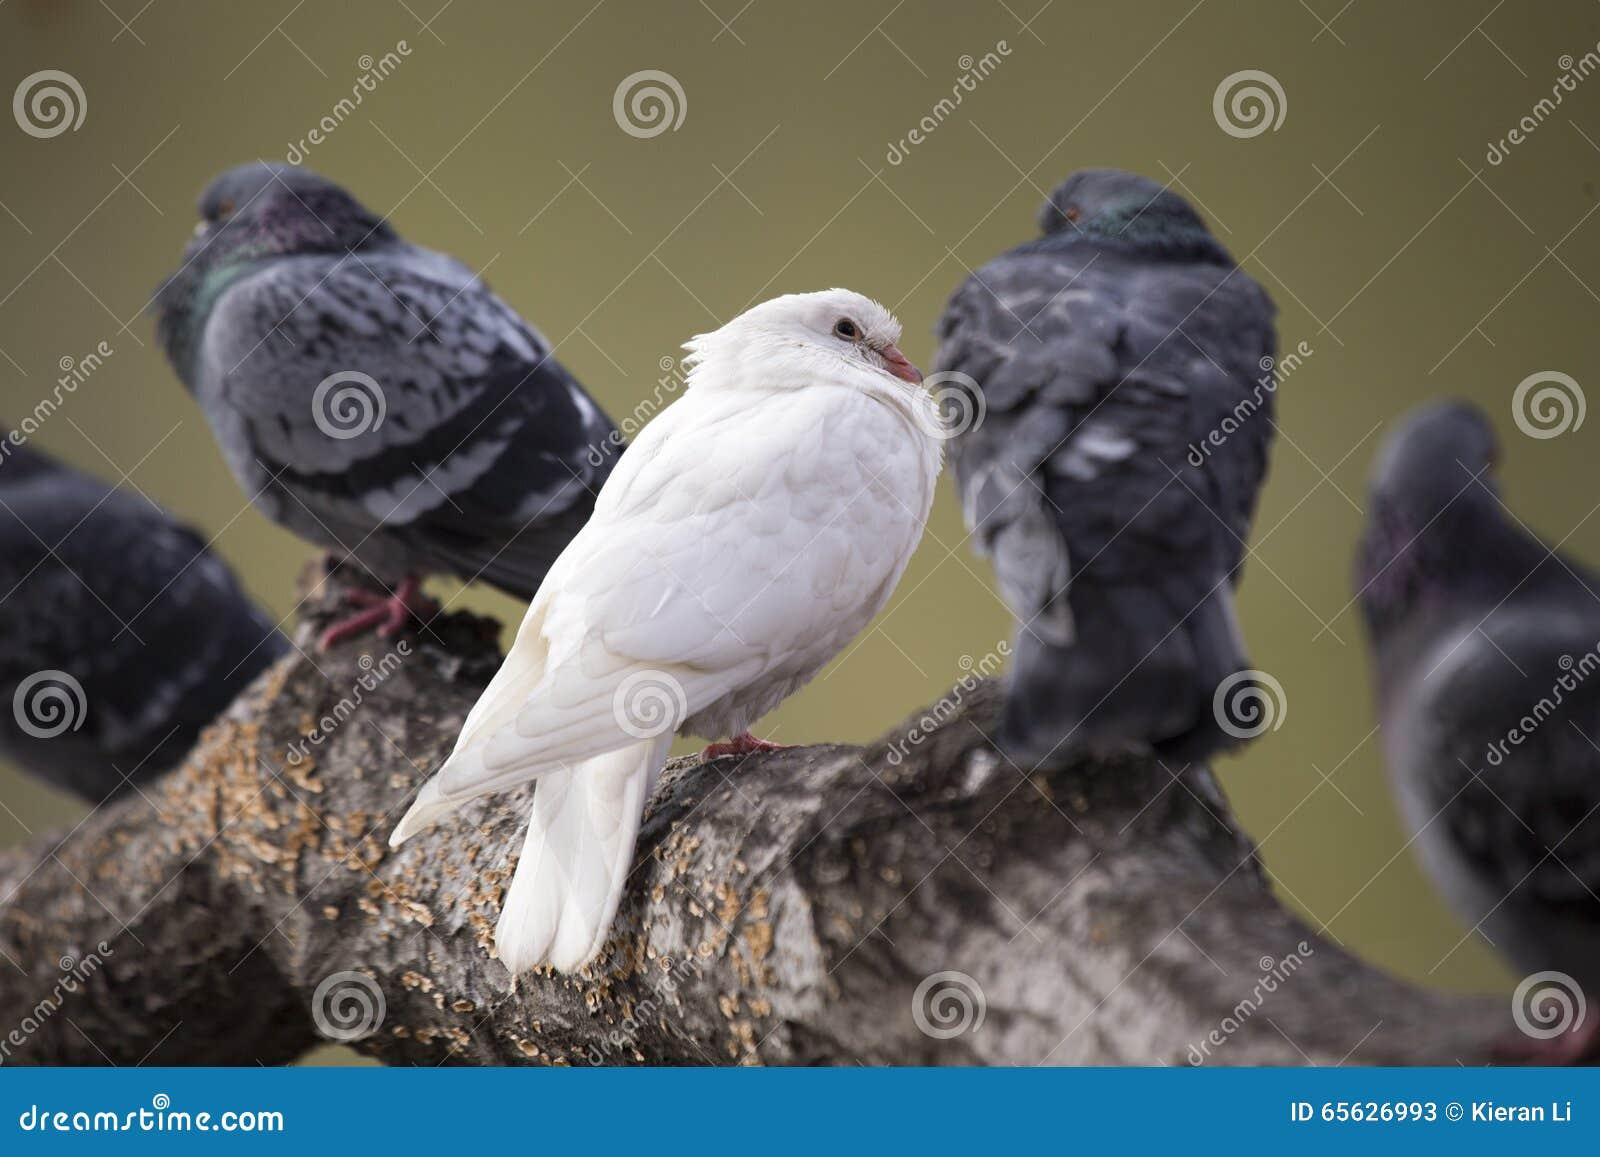 Albino Pigeon